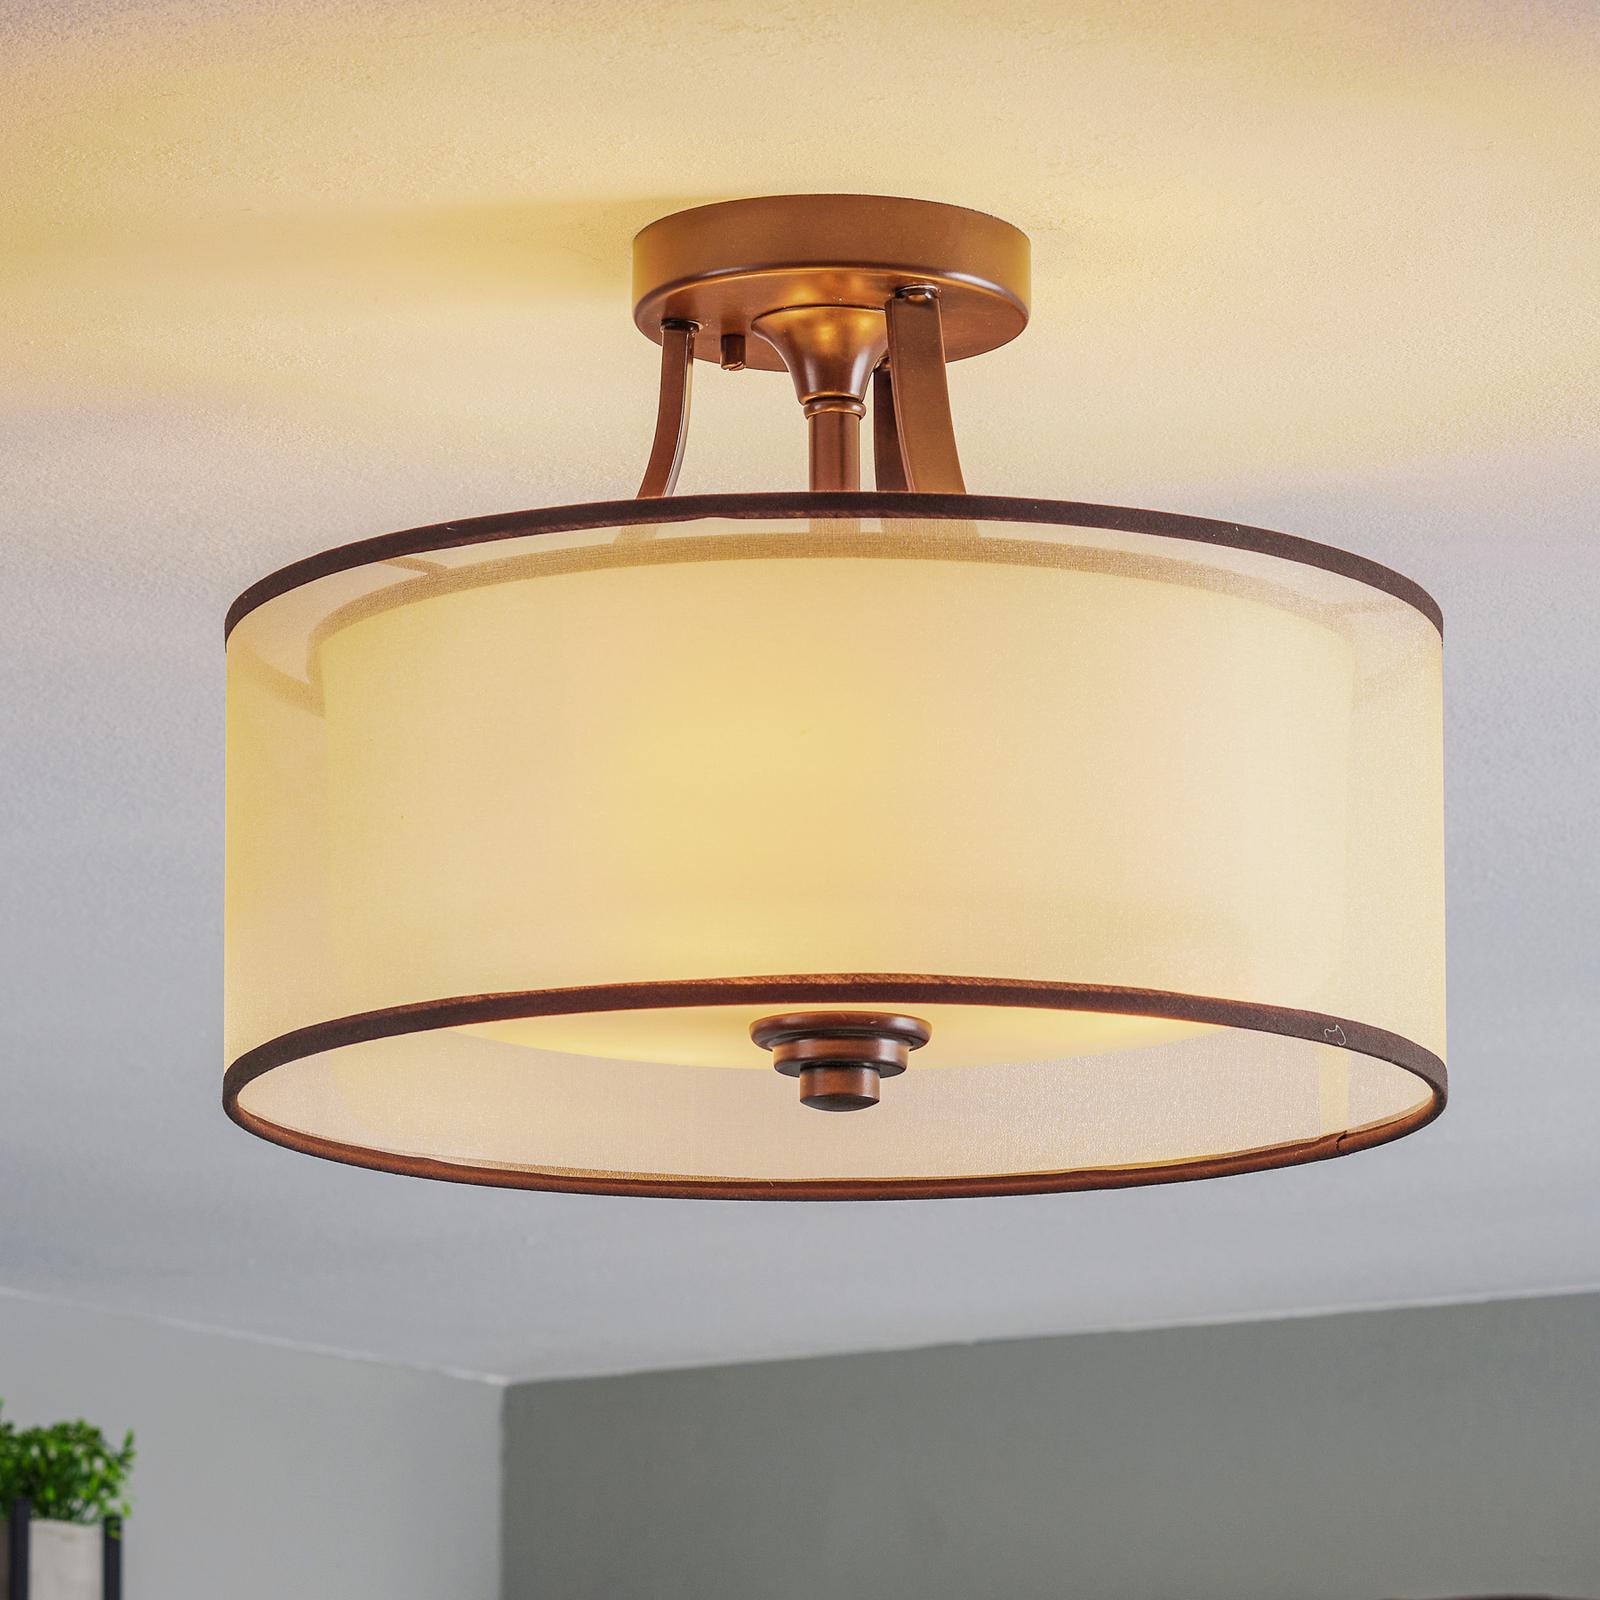 Plafondlamp Lacey met dubbele kap